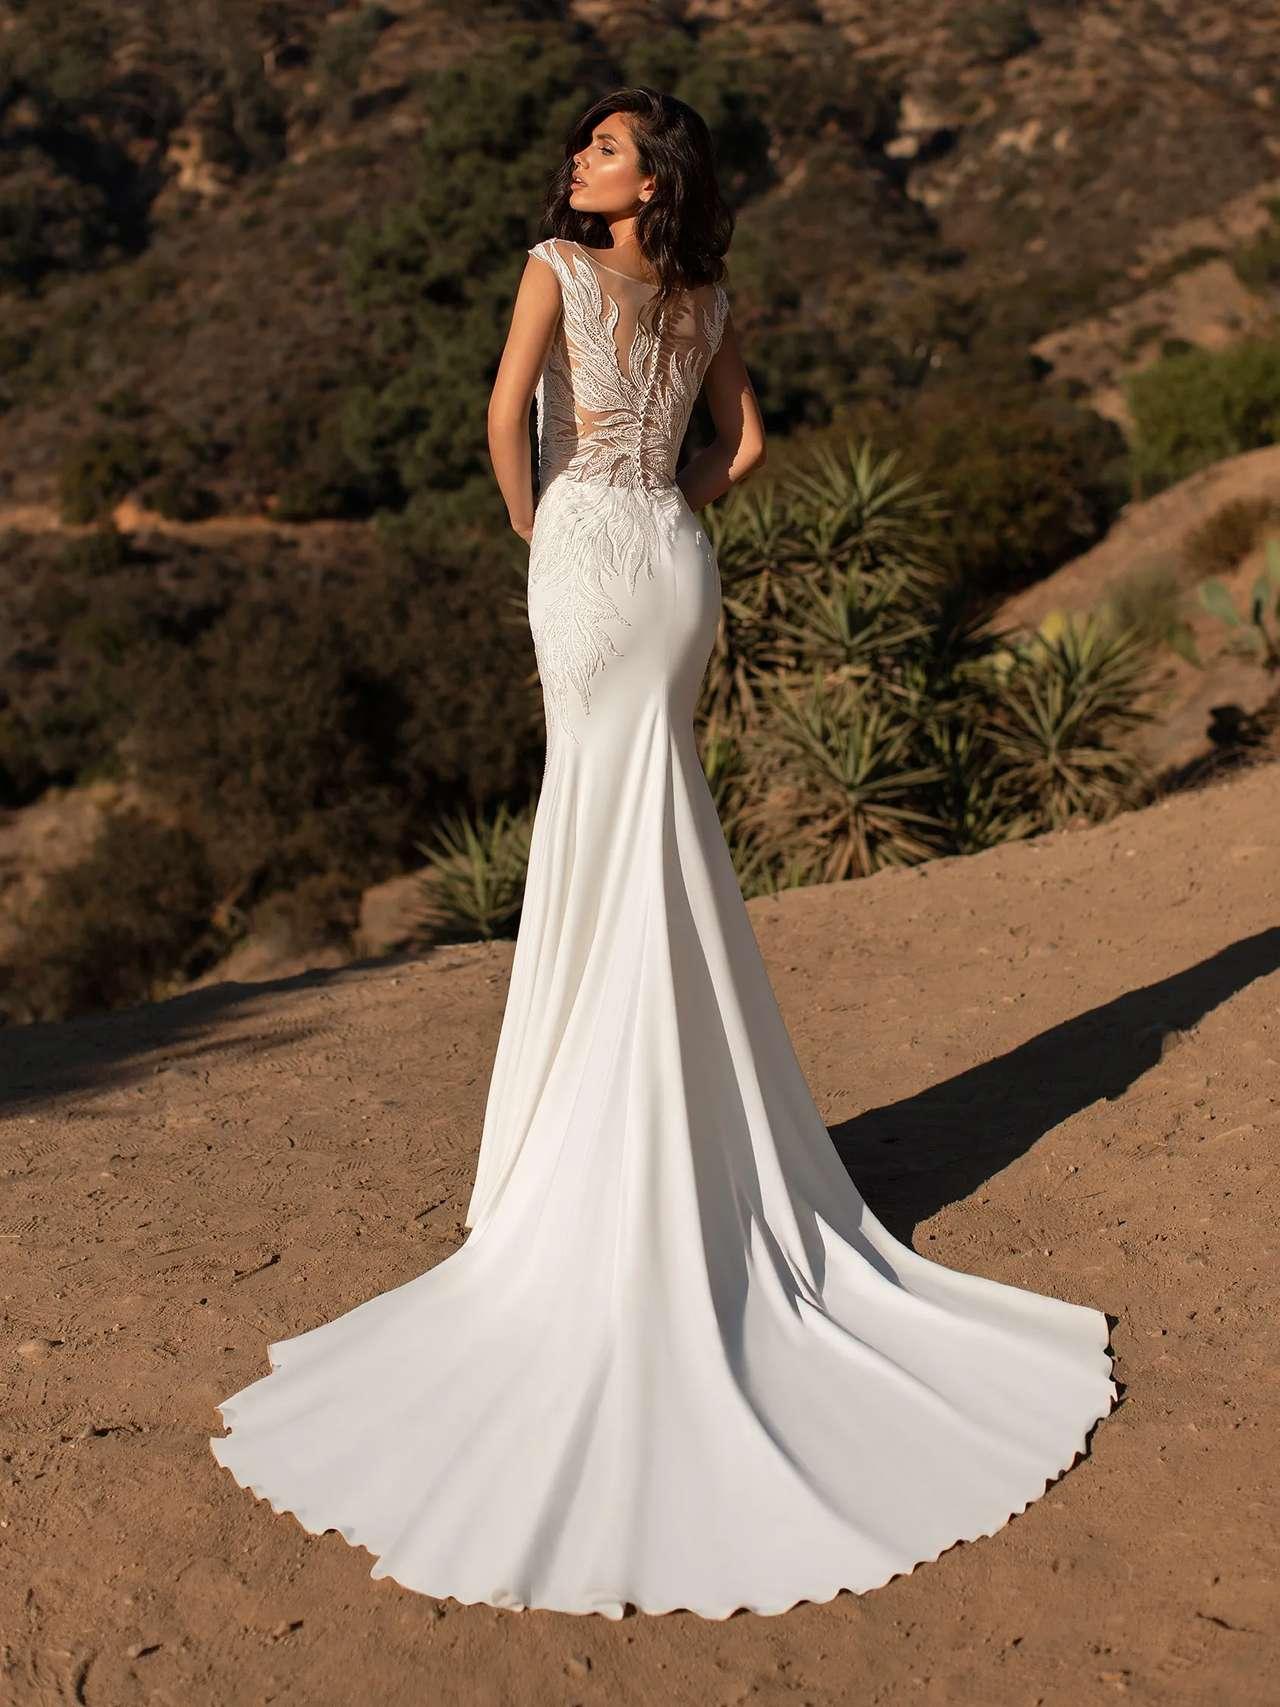 Pronovias 2021 menyasszonyi ruha: Ladd